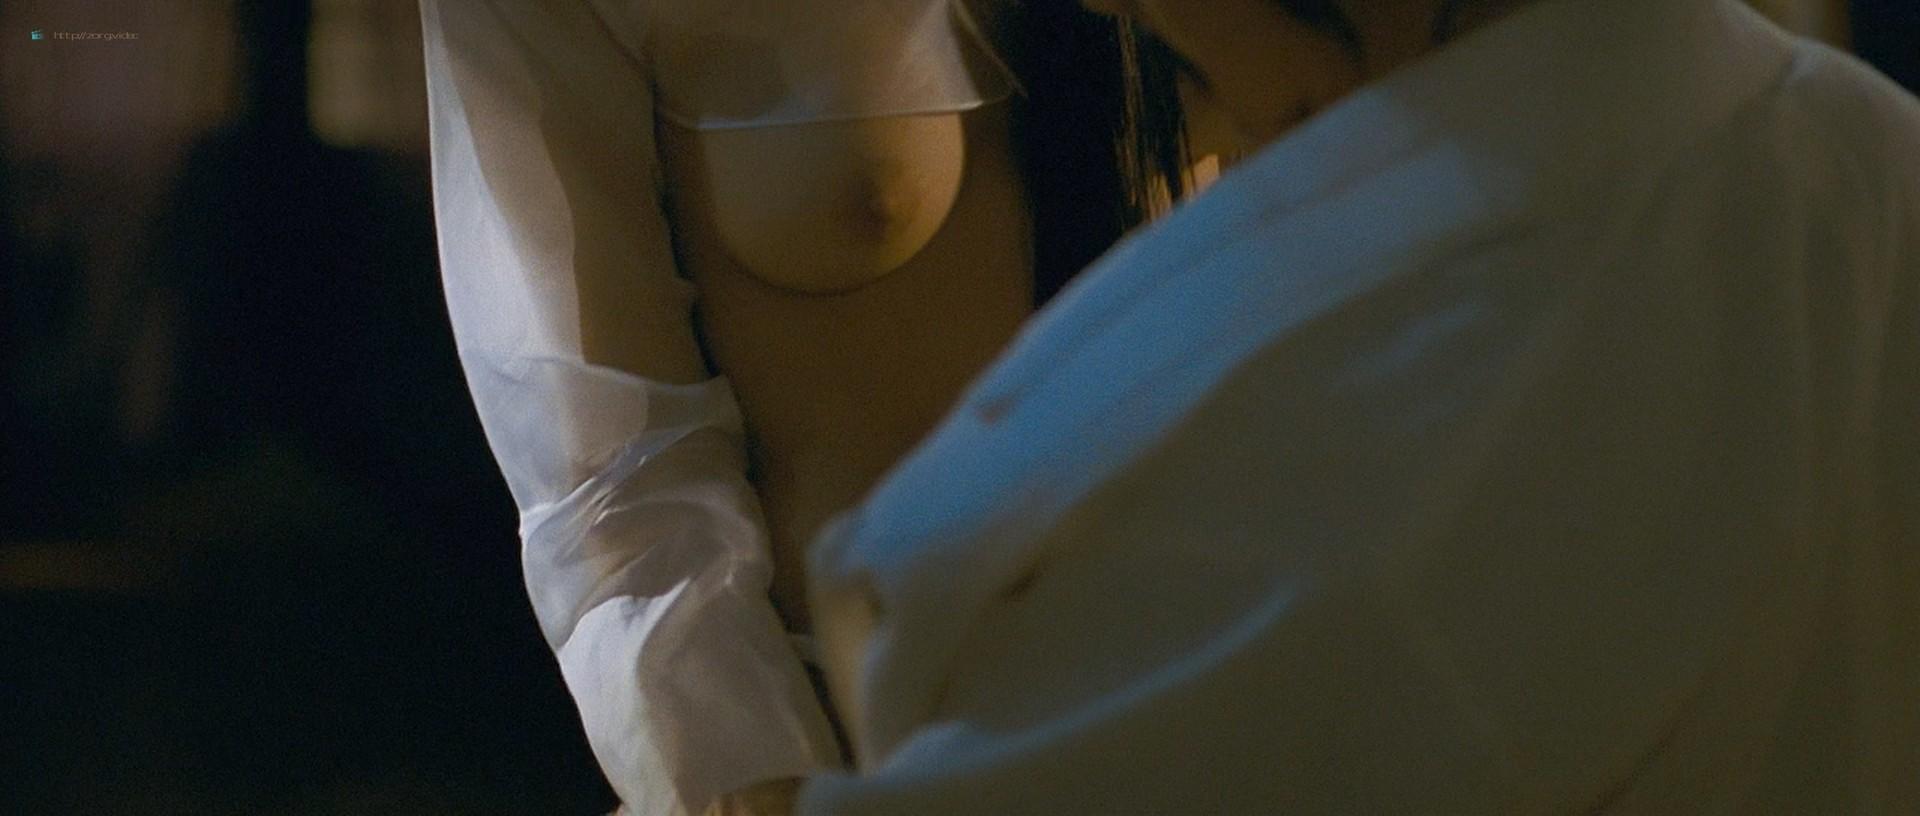 Cho Yeo-jeong nude sex Ryu Hyun-kyung nude too- The Servant (KR-2010) HD 1080p BluRay (14)